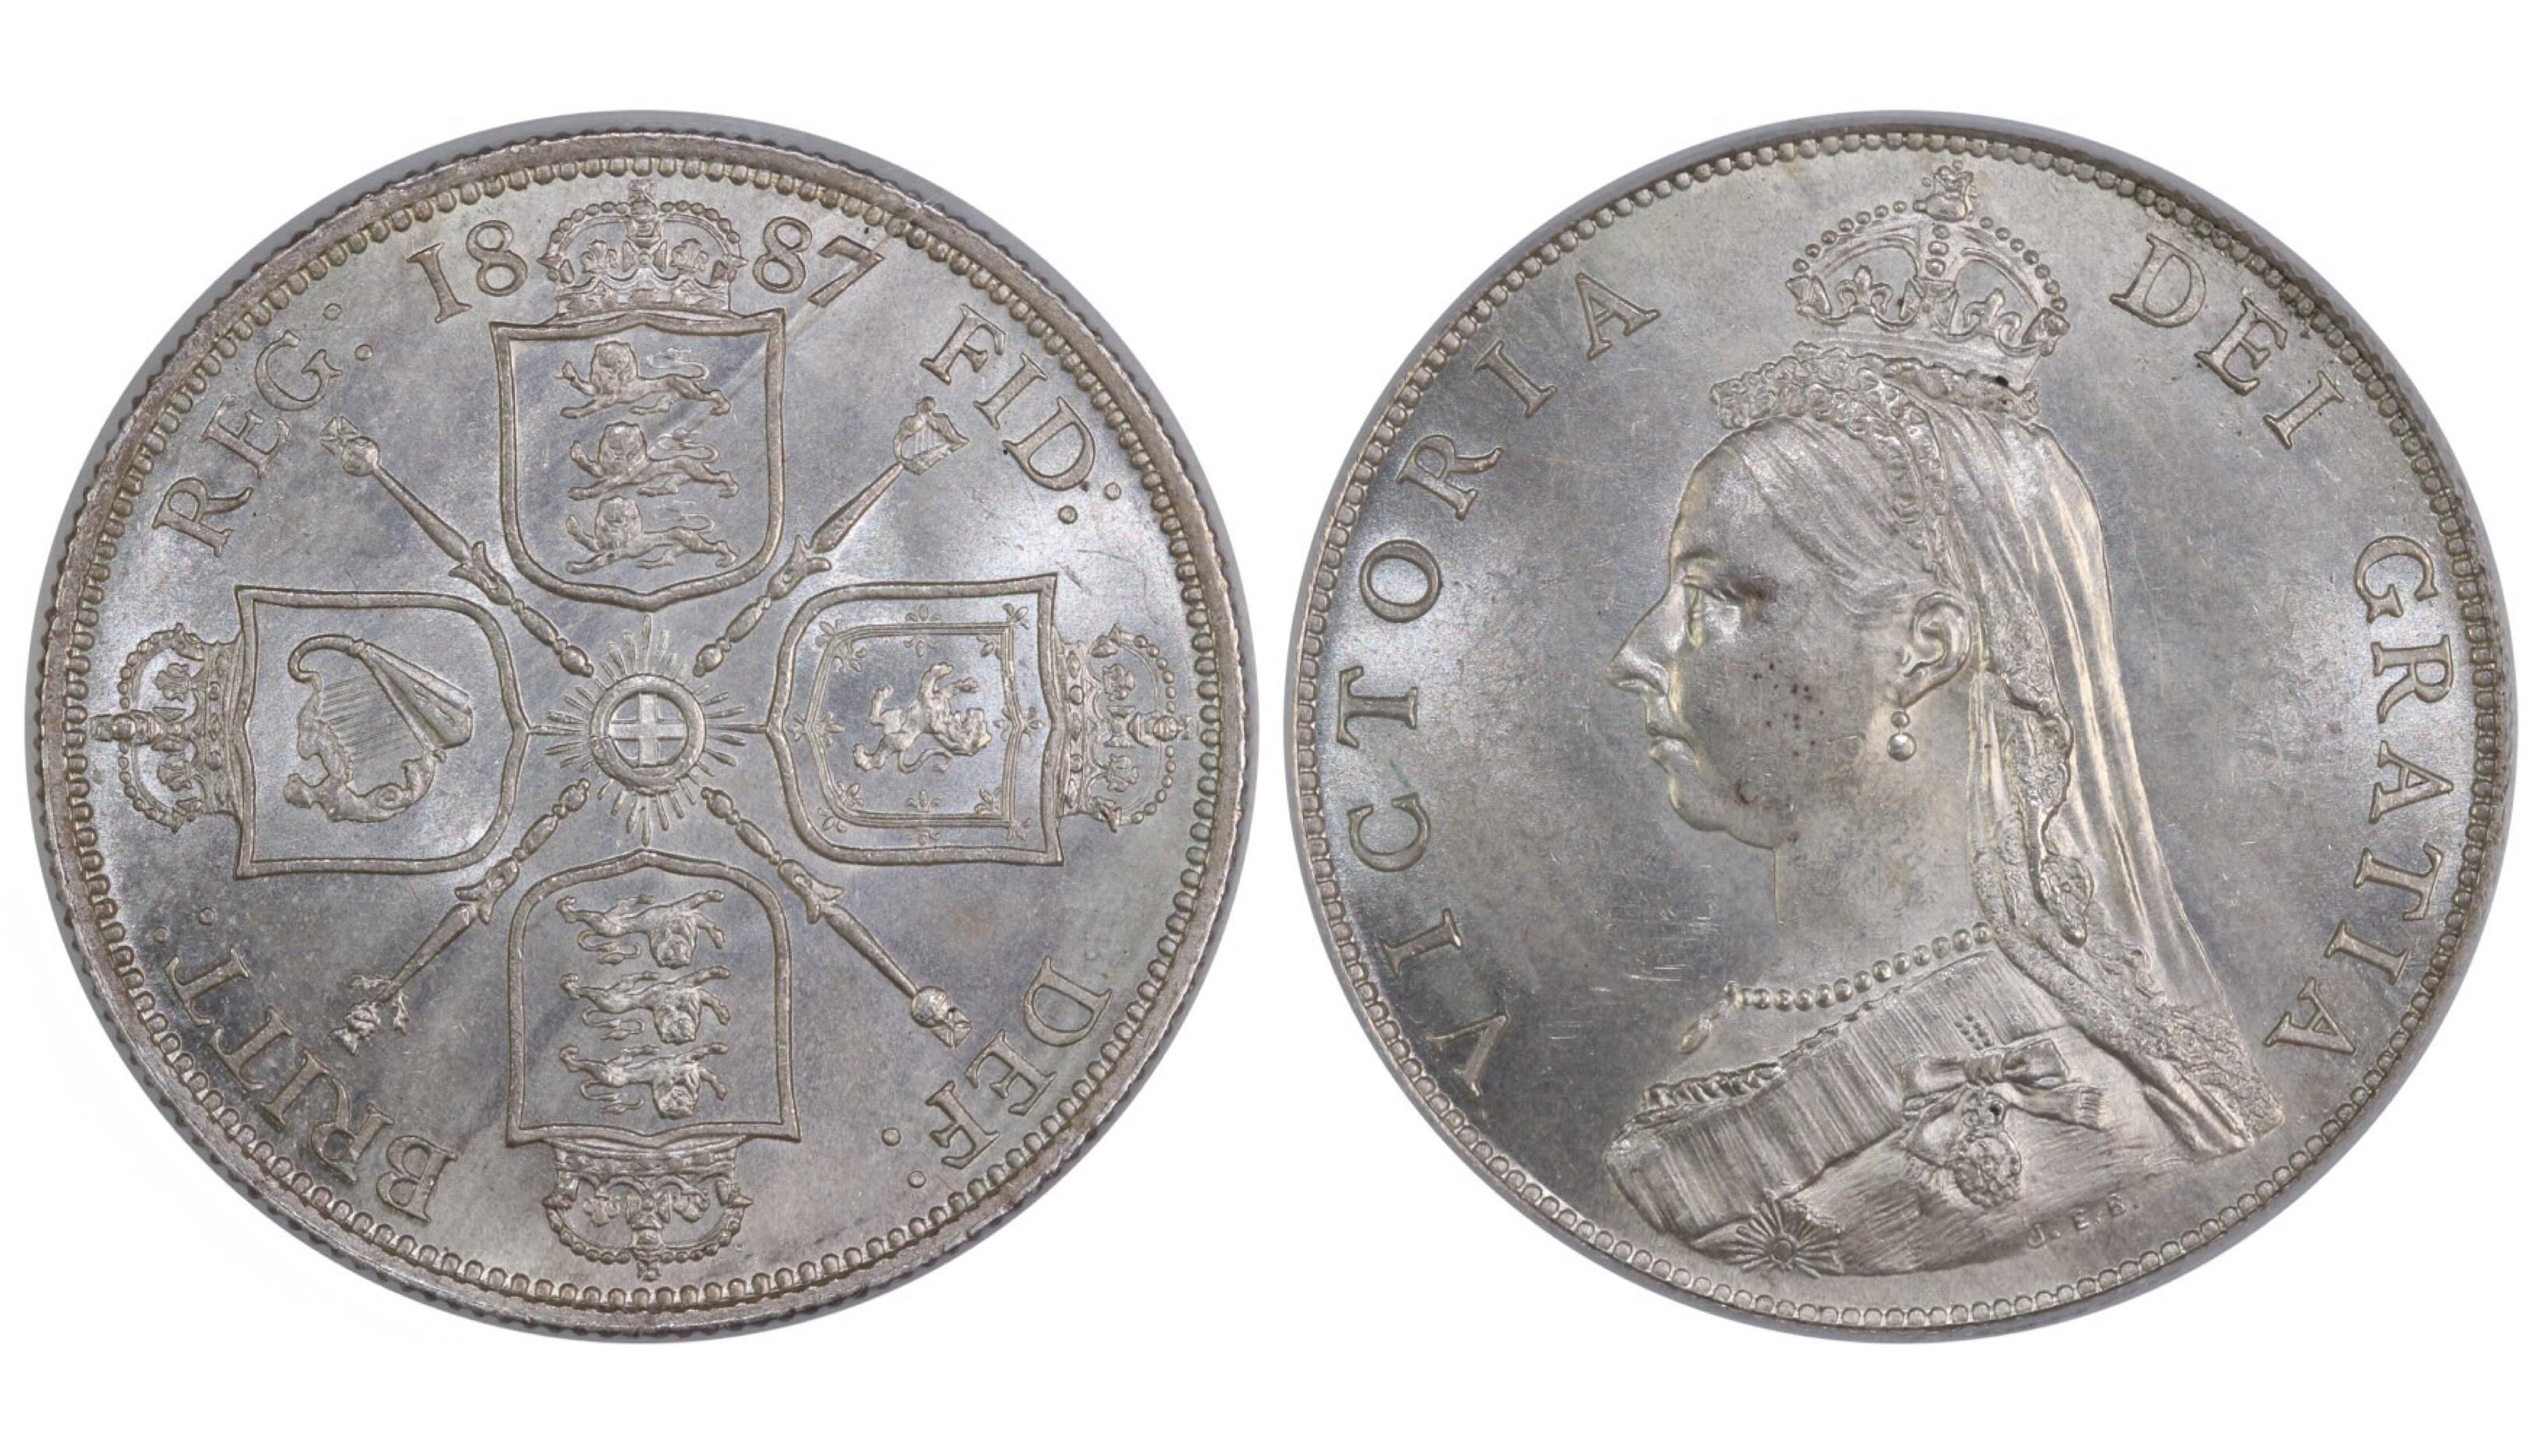 1887 Florin, CGS 78, UNC, Davies 810, UIN 38832